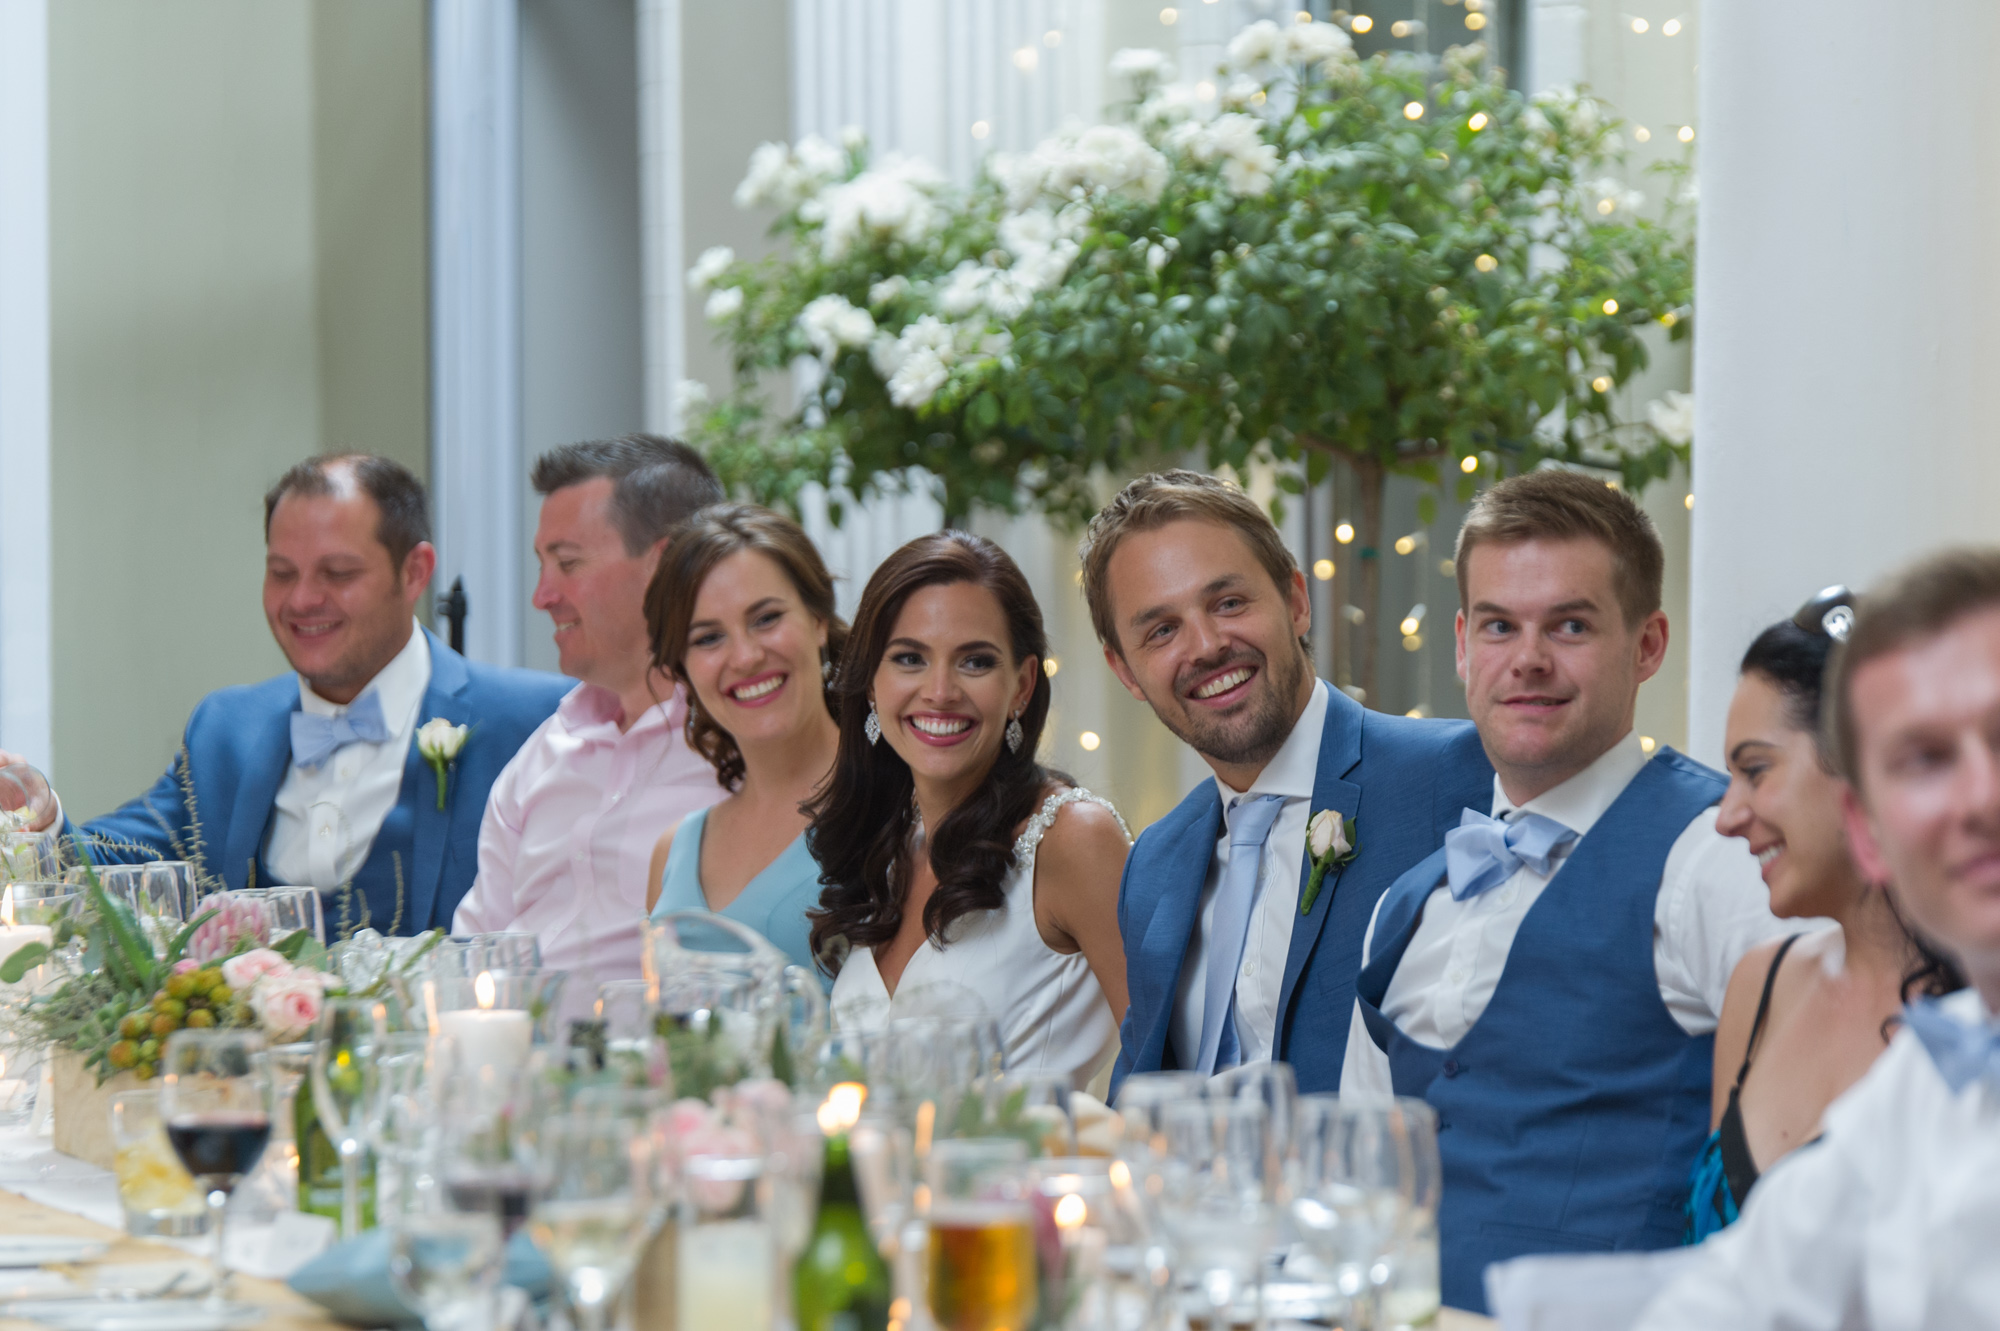 john-henry-wedding-photographer-reception-001-30.jpg